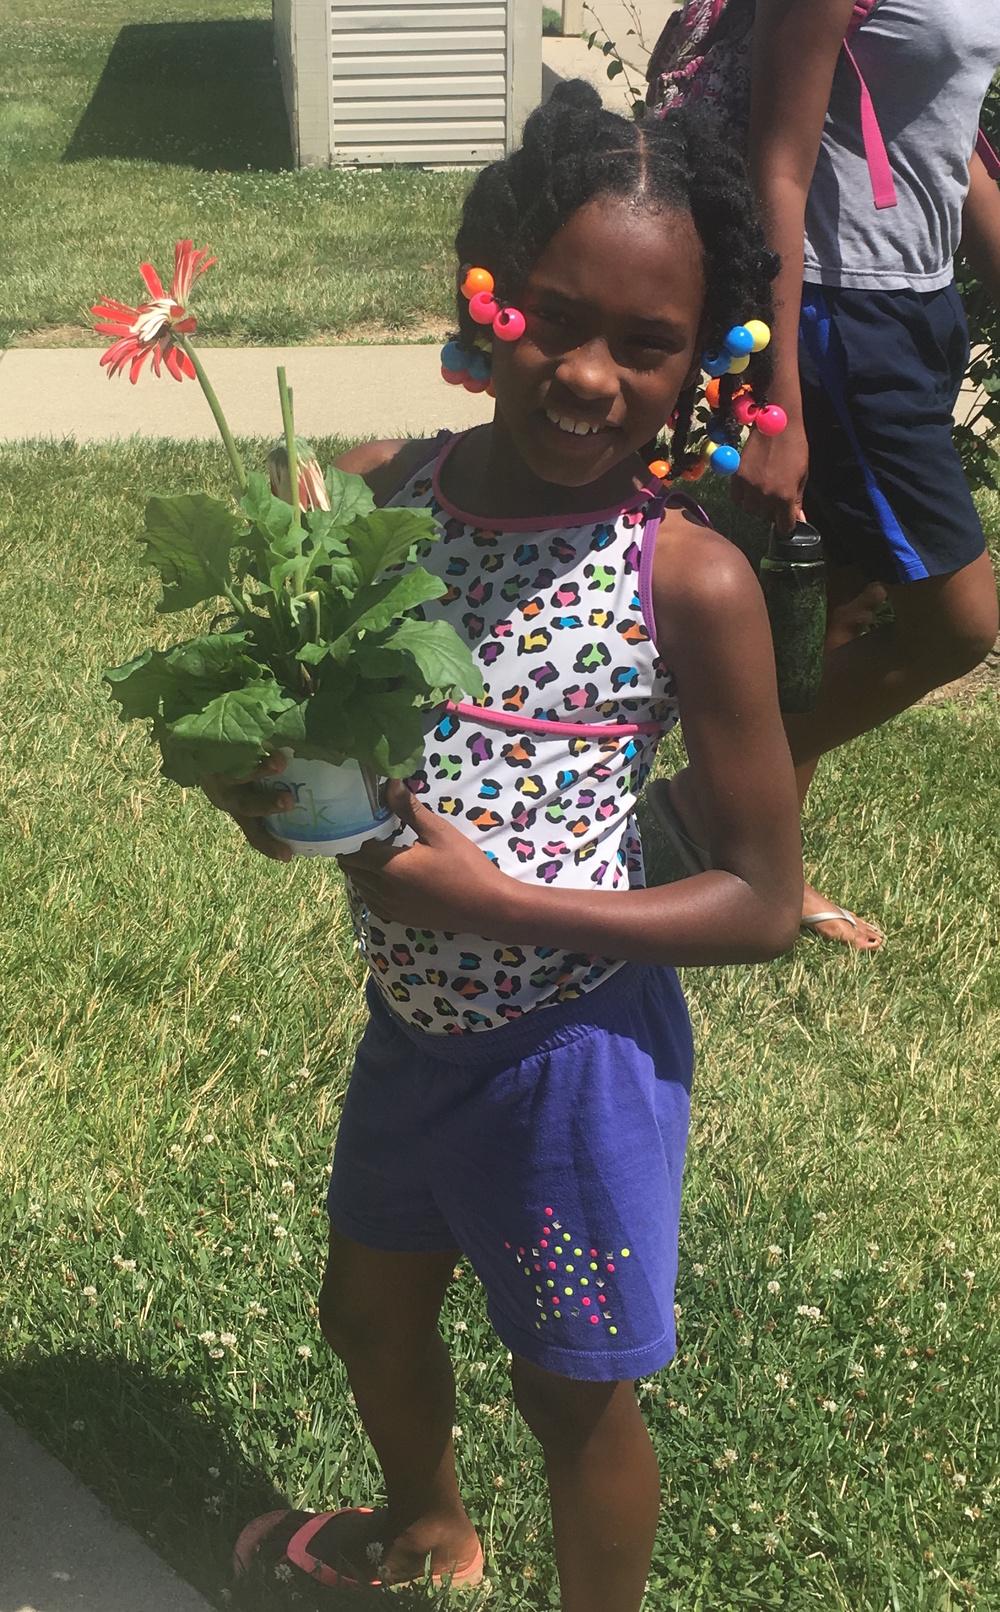 Pheasant Run's Aniyah Banks got a flower for her mom.